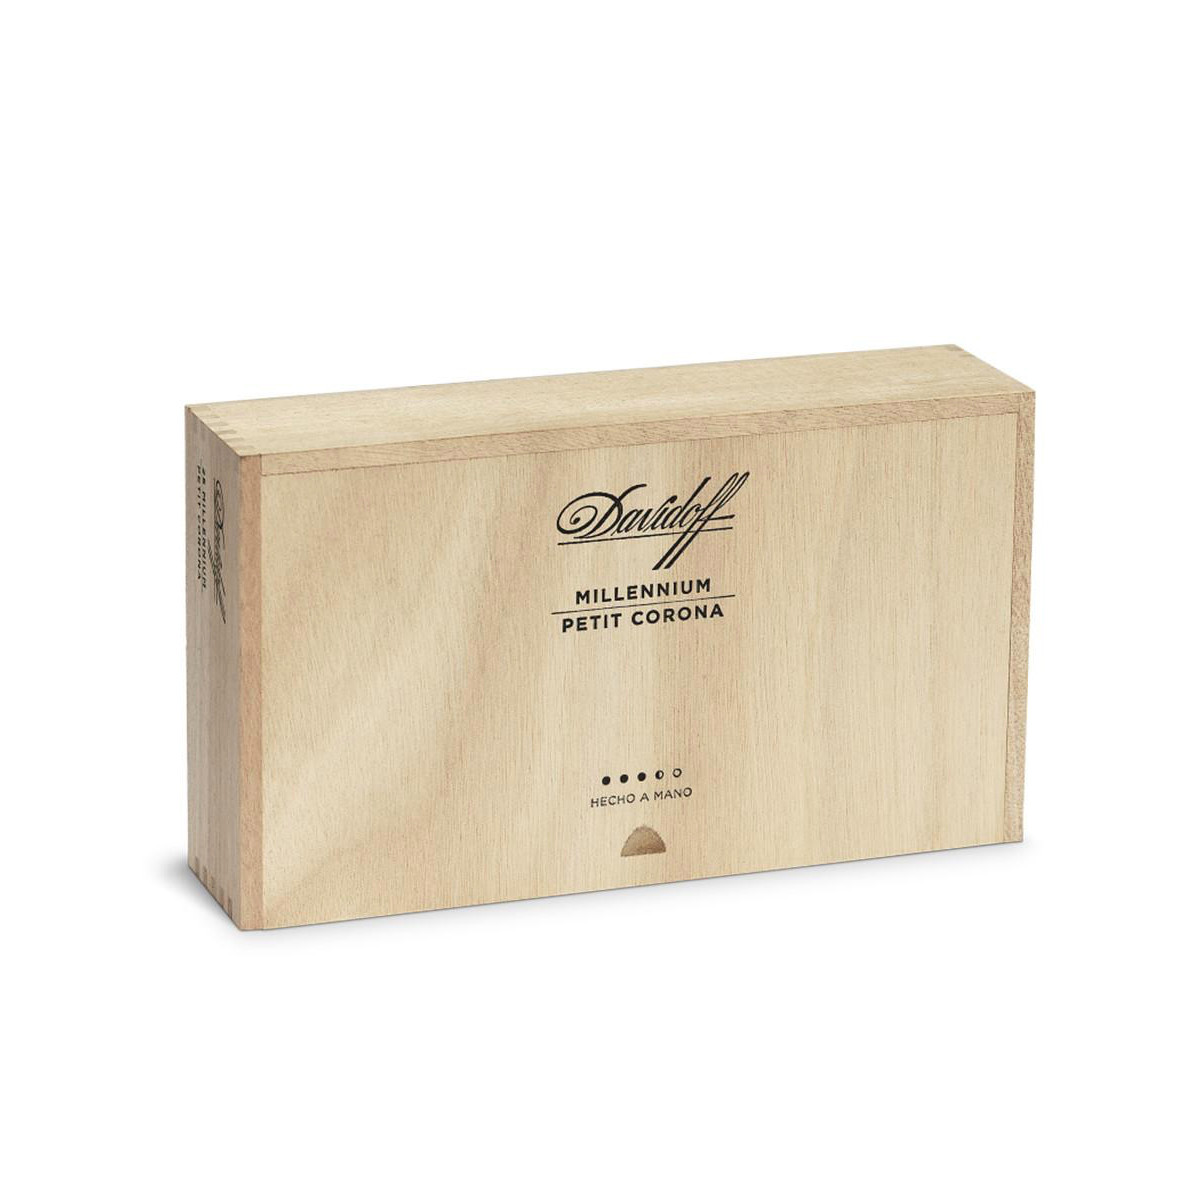 Davidoff Millennium Petit Corona (4.5x41 / Box 25)